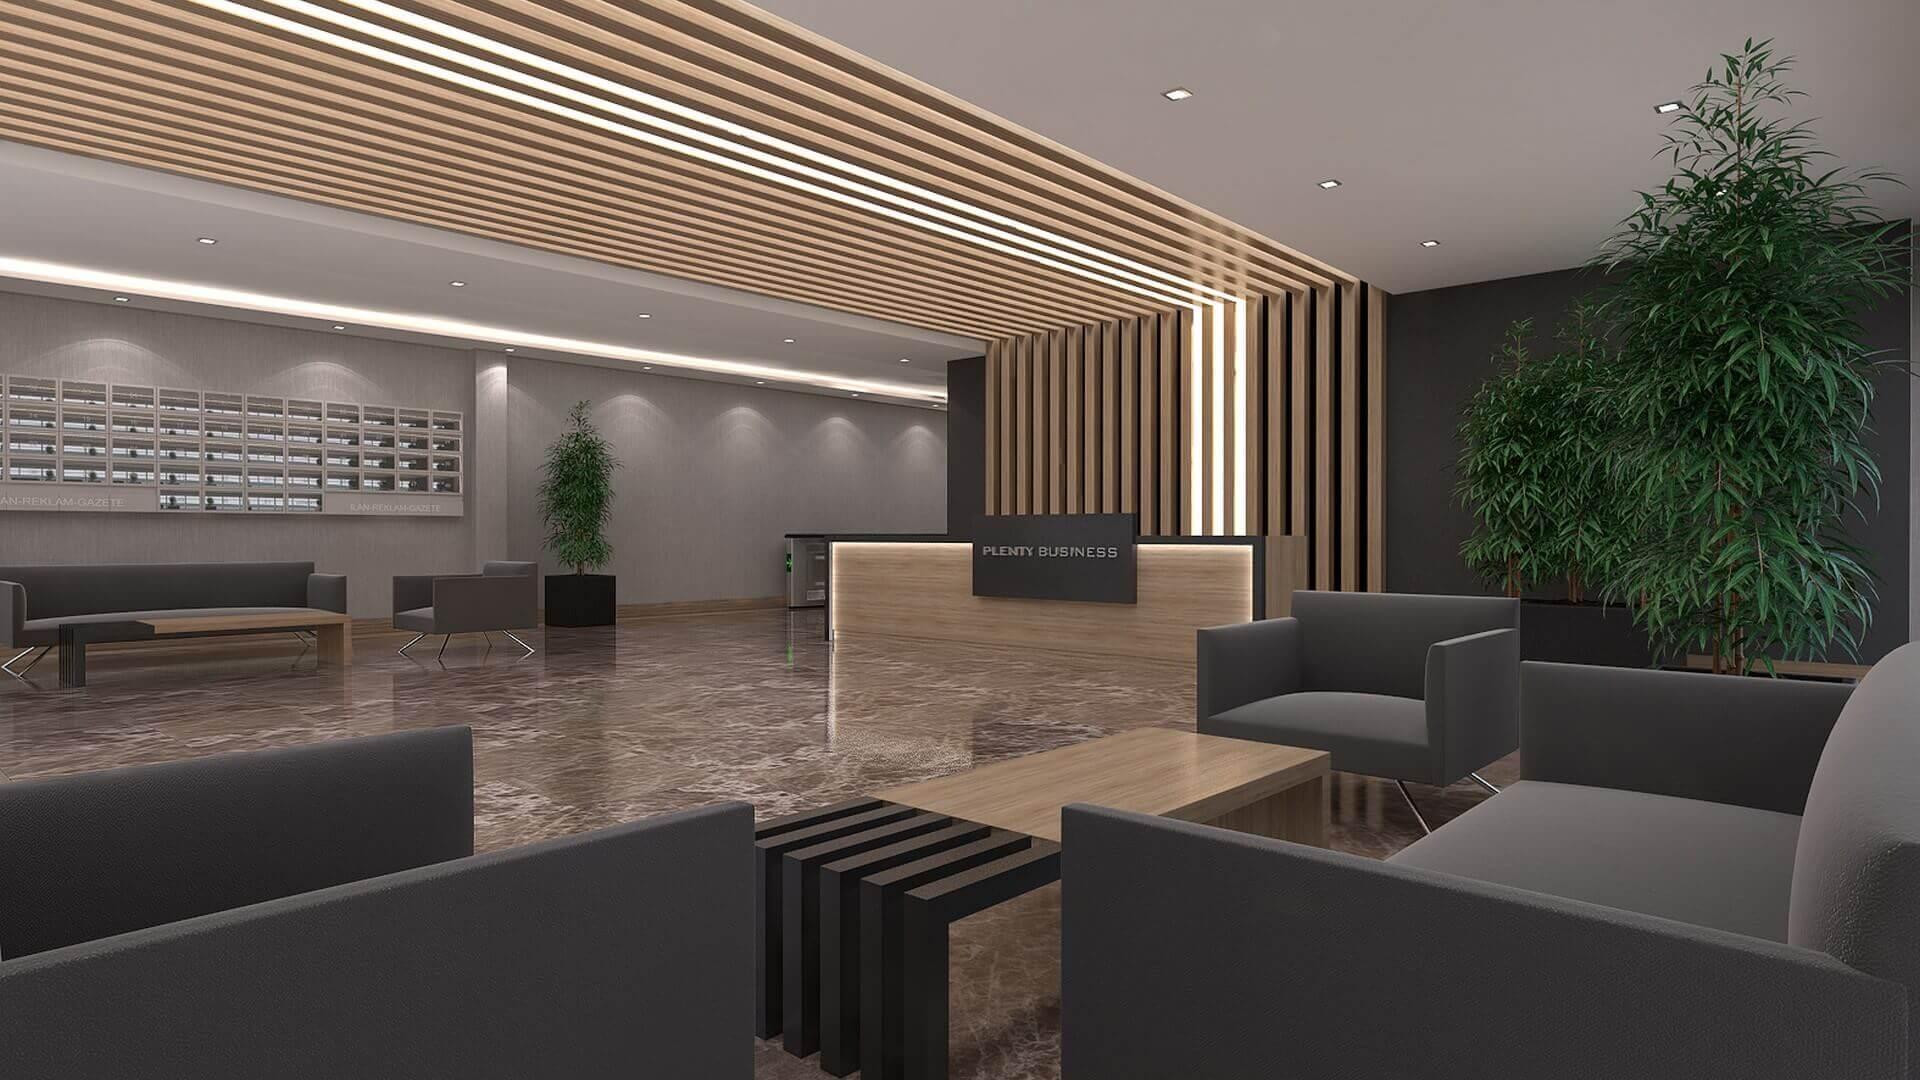 Ankara office architect 2661 Plenty Business Offices